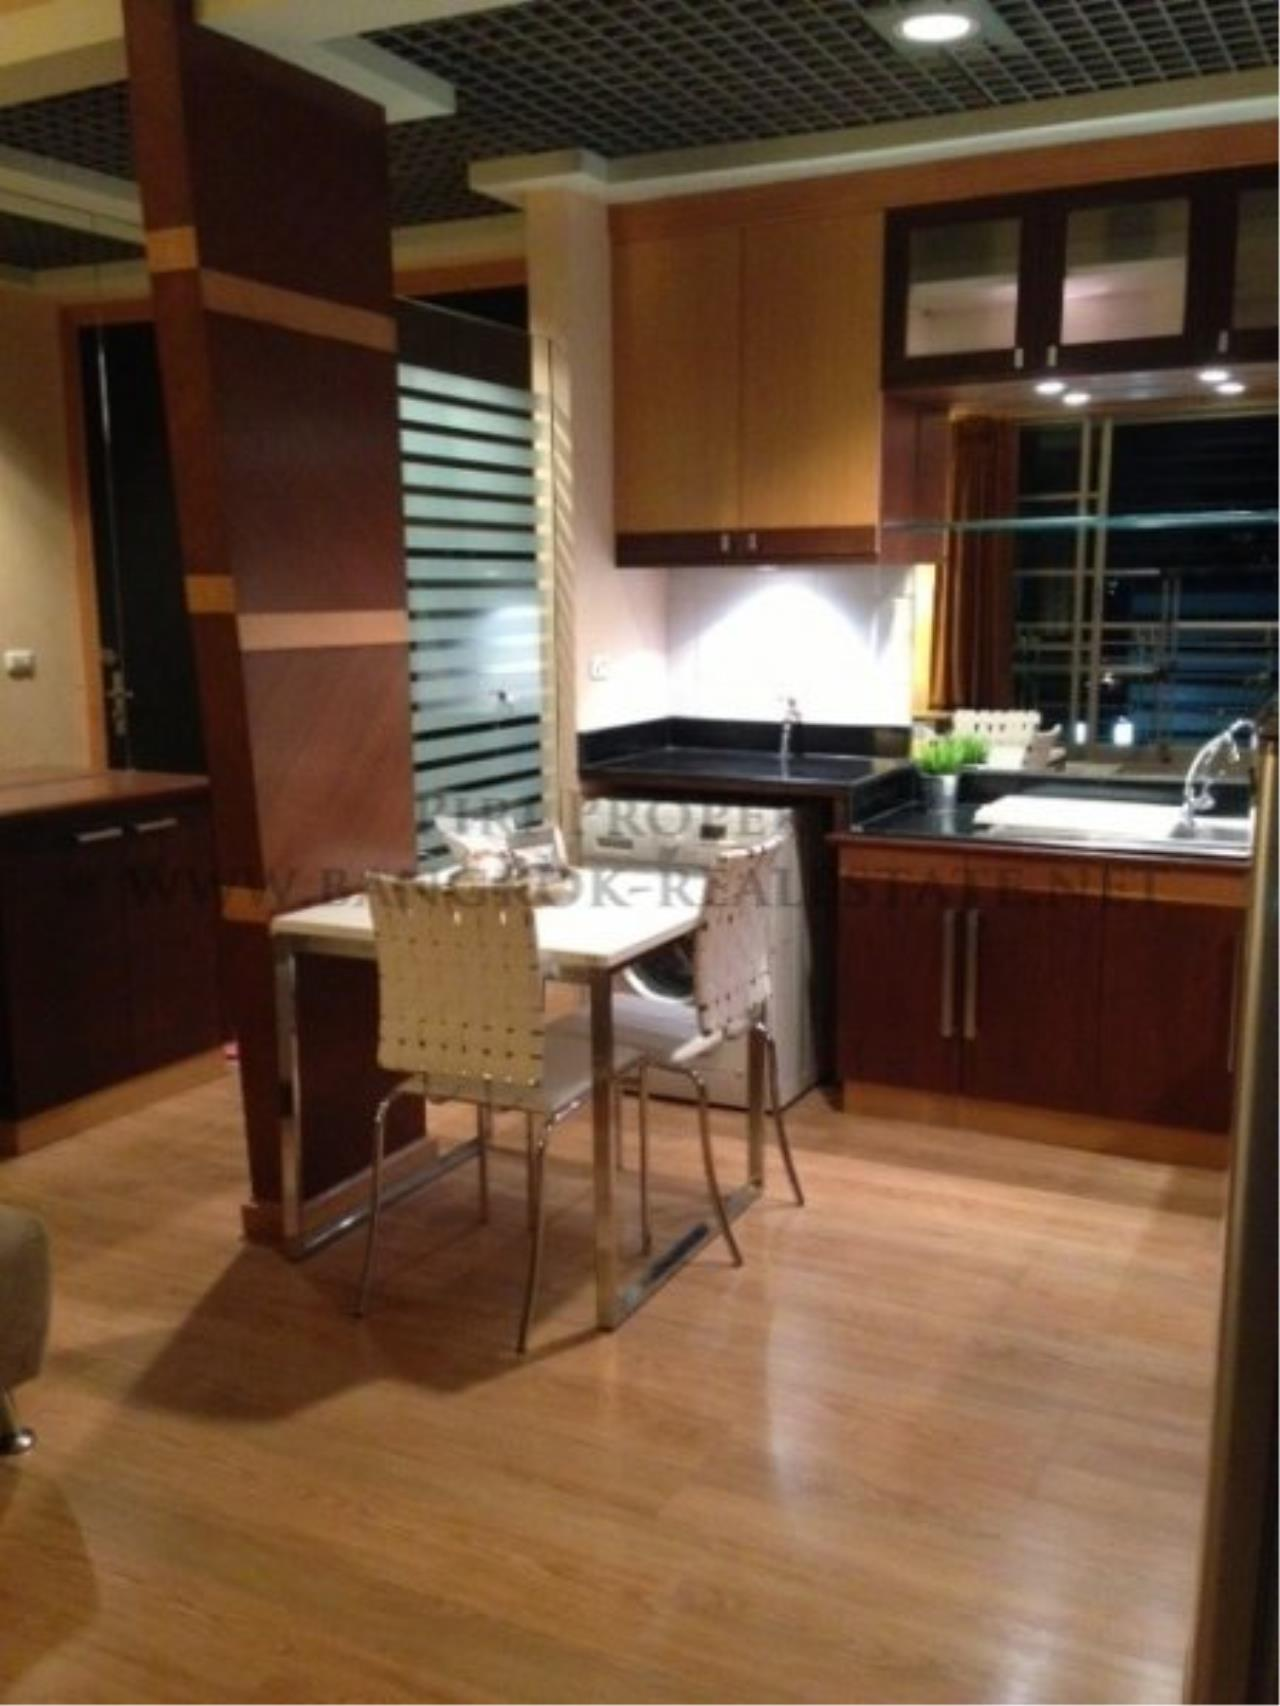 Piri Property Agency's Nice 1 Bedroom Condo near Ratchtewi BTS Station - 58 SQM - 30K 3